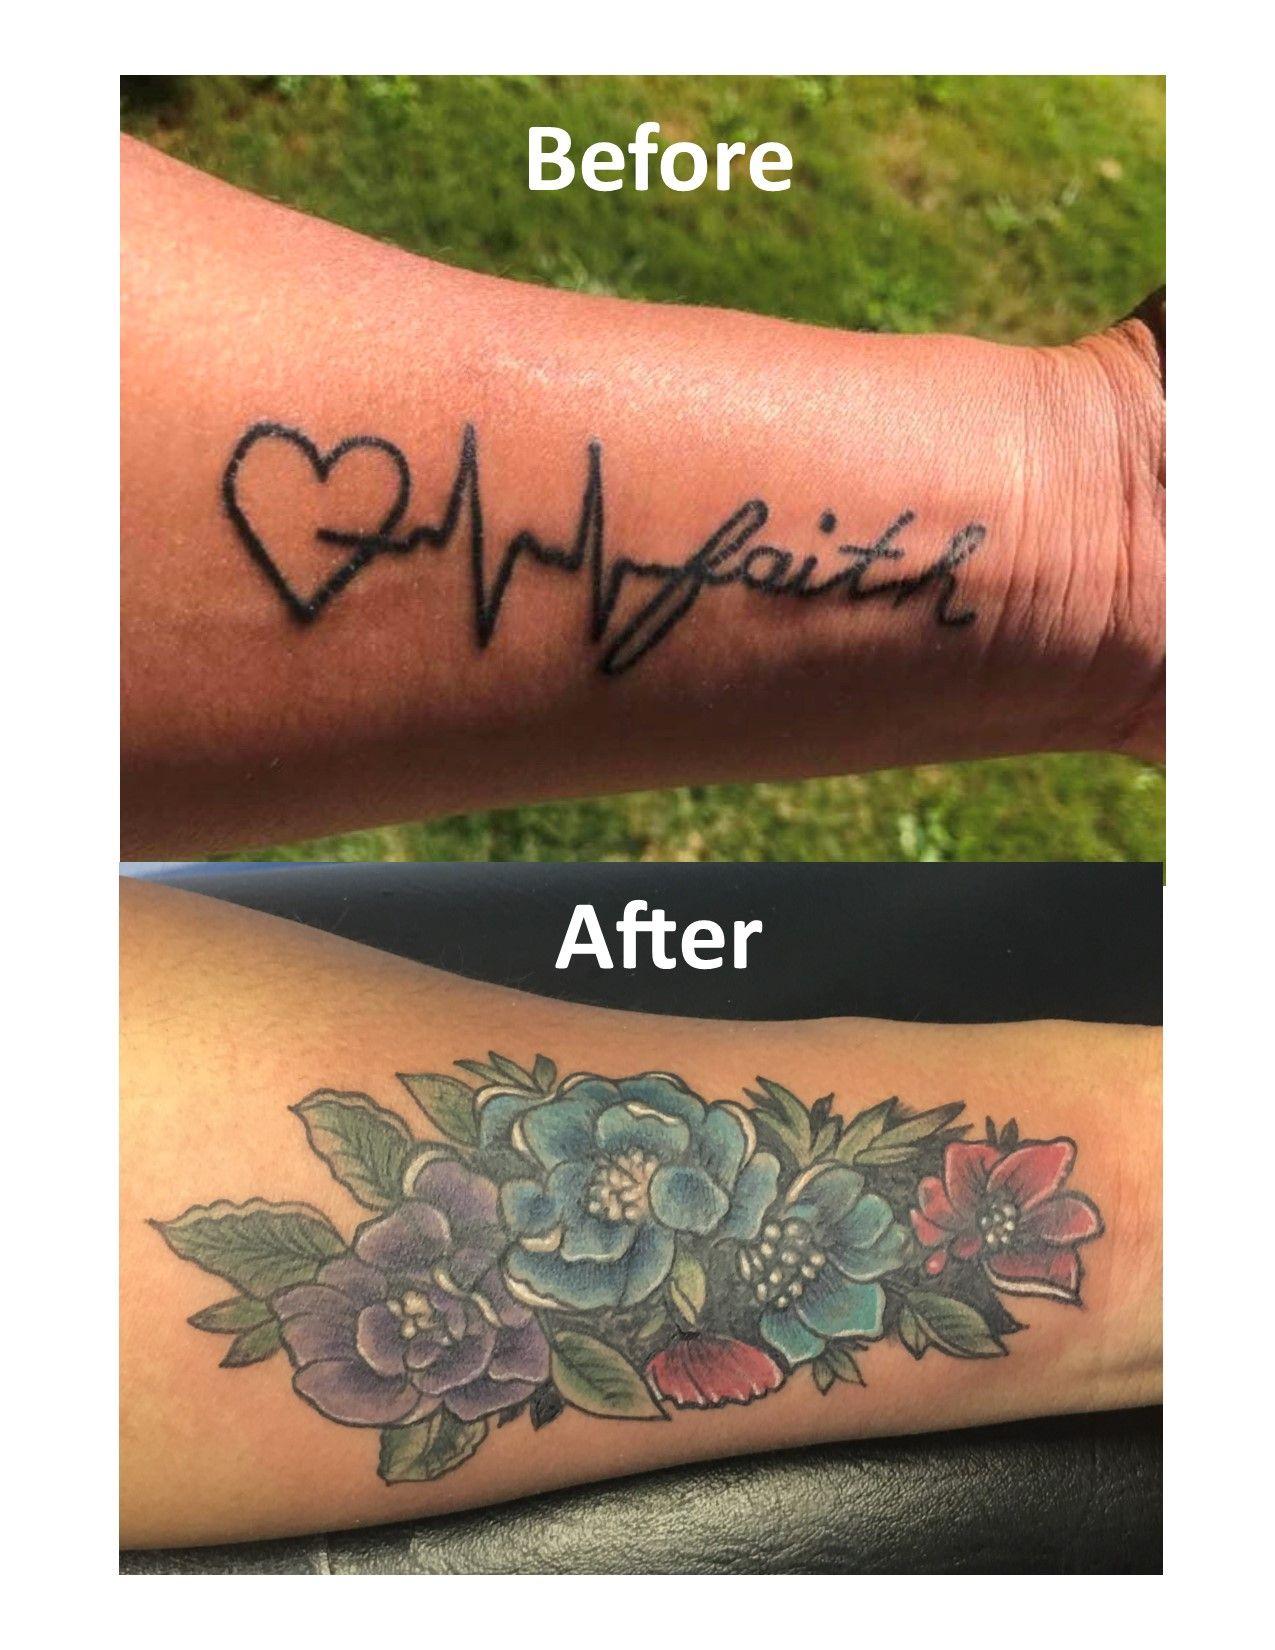 tattoo tattoos JulioDeLeon raleightattoo tattooartist